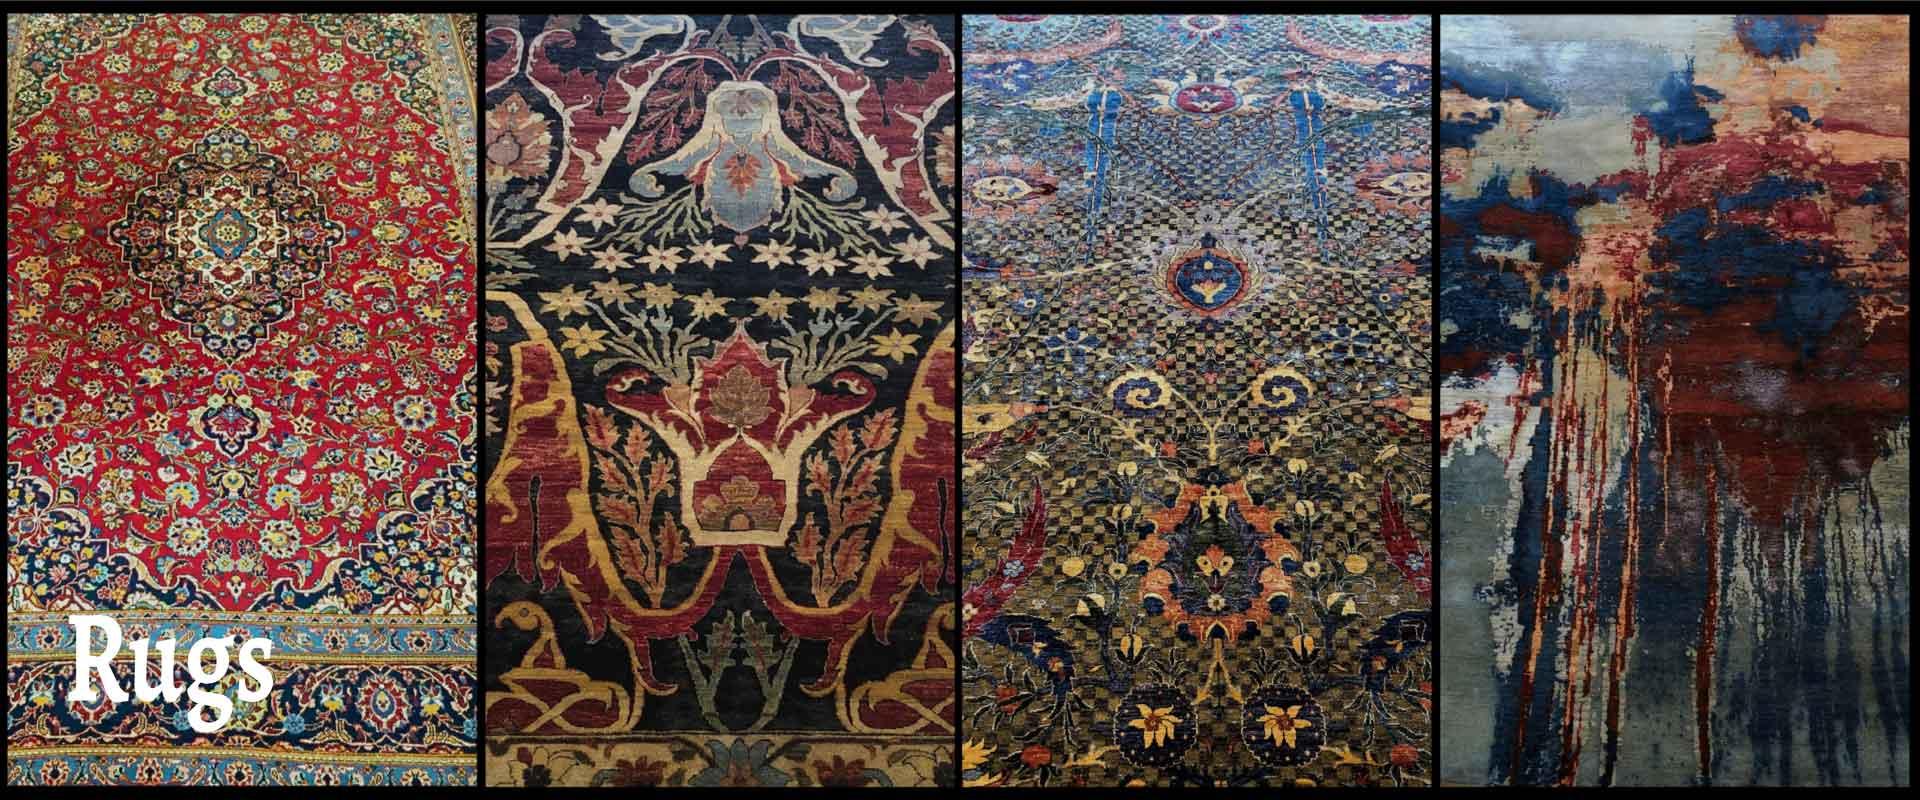 rugs-header